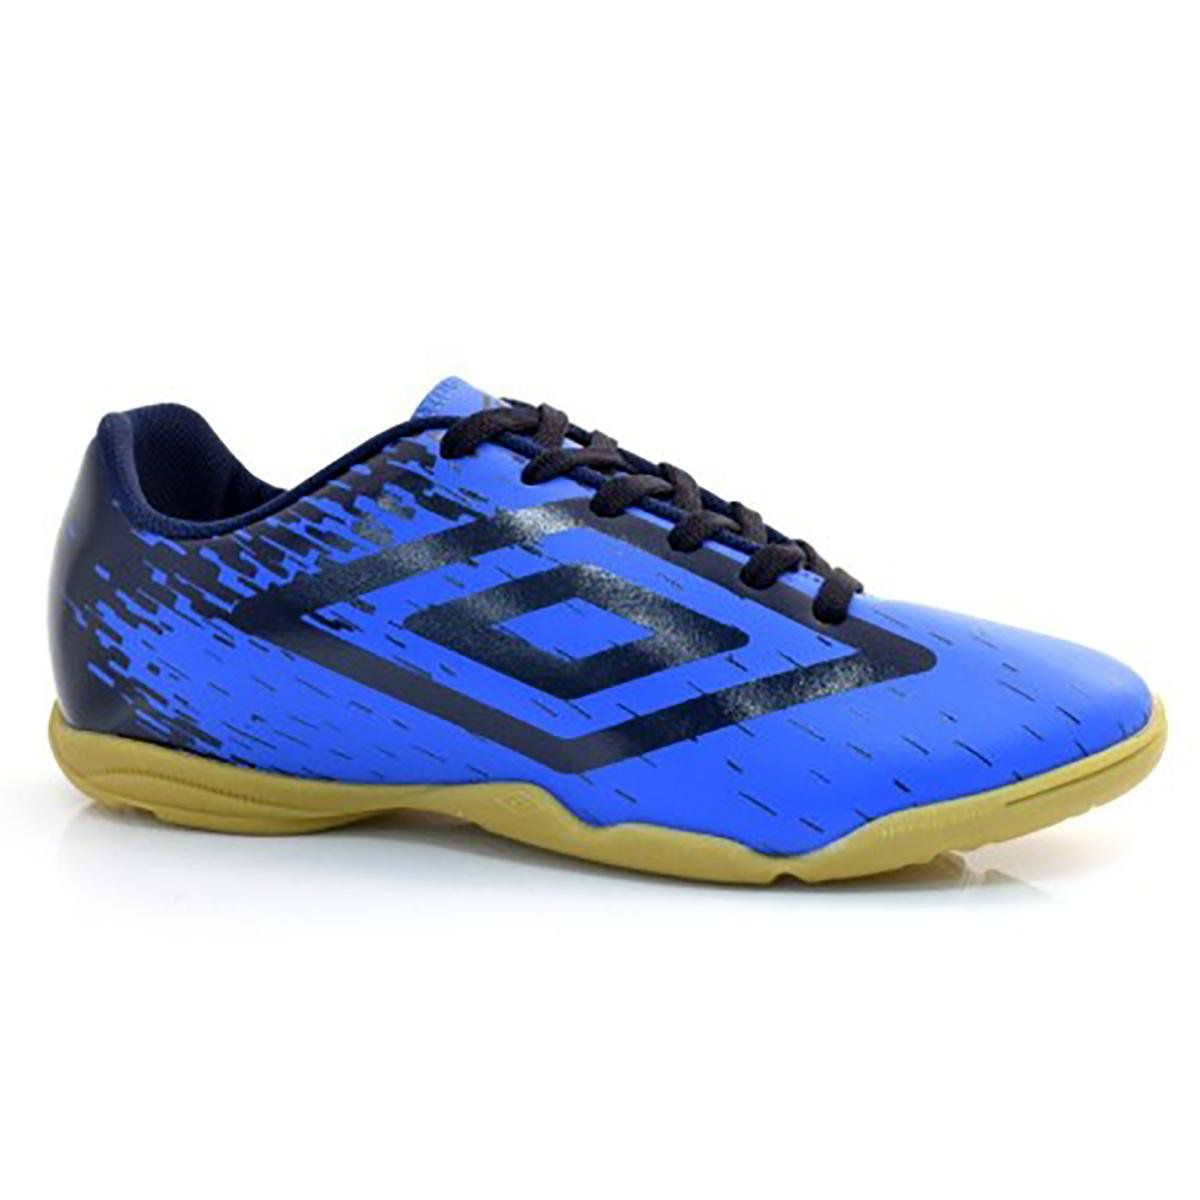 Chuteira Adulto Umbro Acid Futsal - Marinho